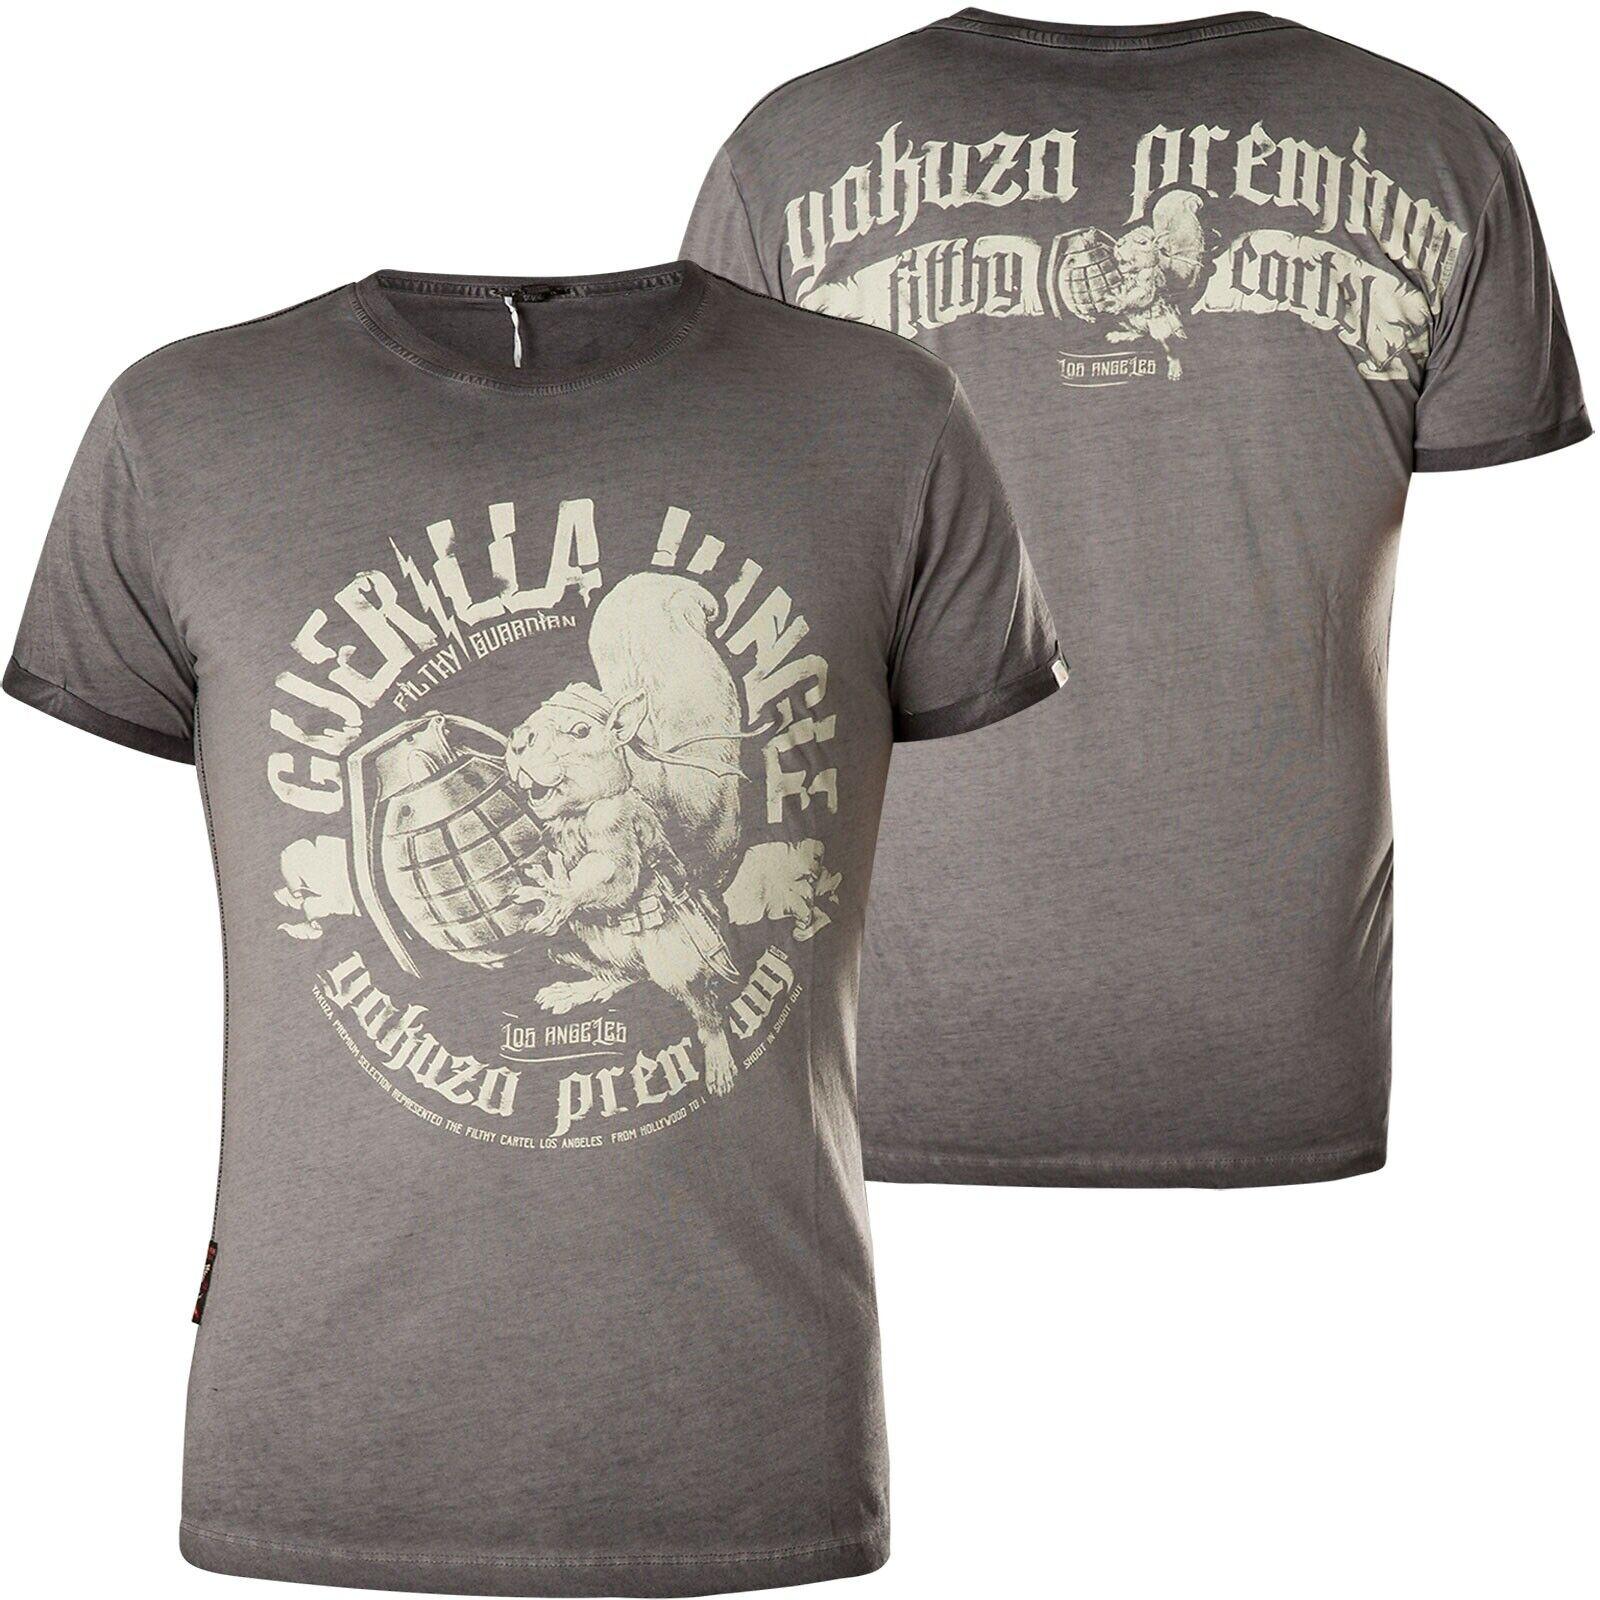 1b855d4fc Yakuza Premium T-Shirt 400 Dark grey Vintage nptixk3144-T-Shirts ...